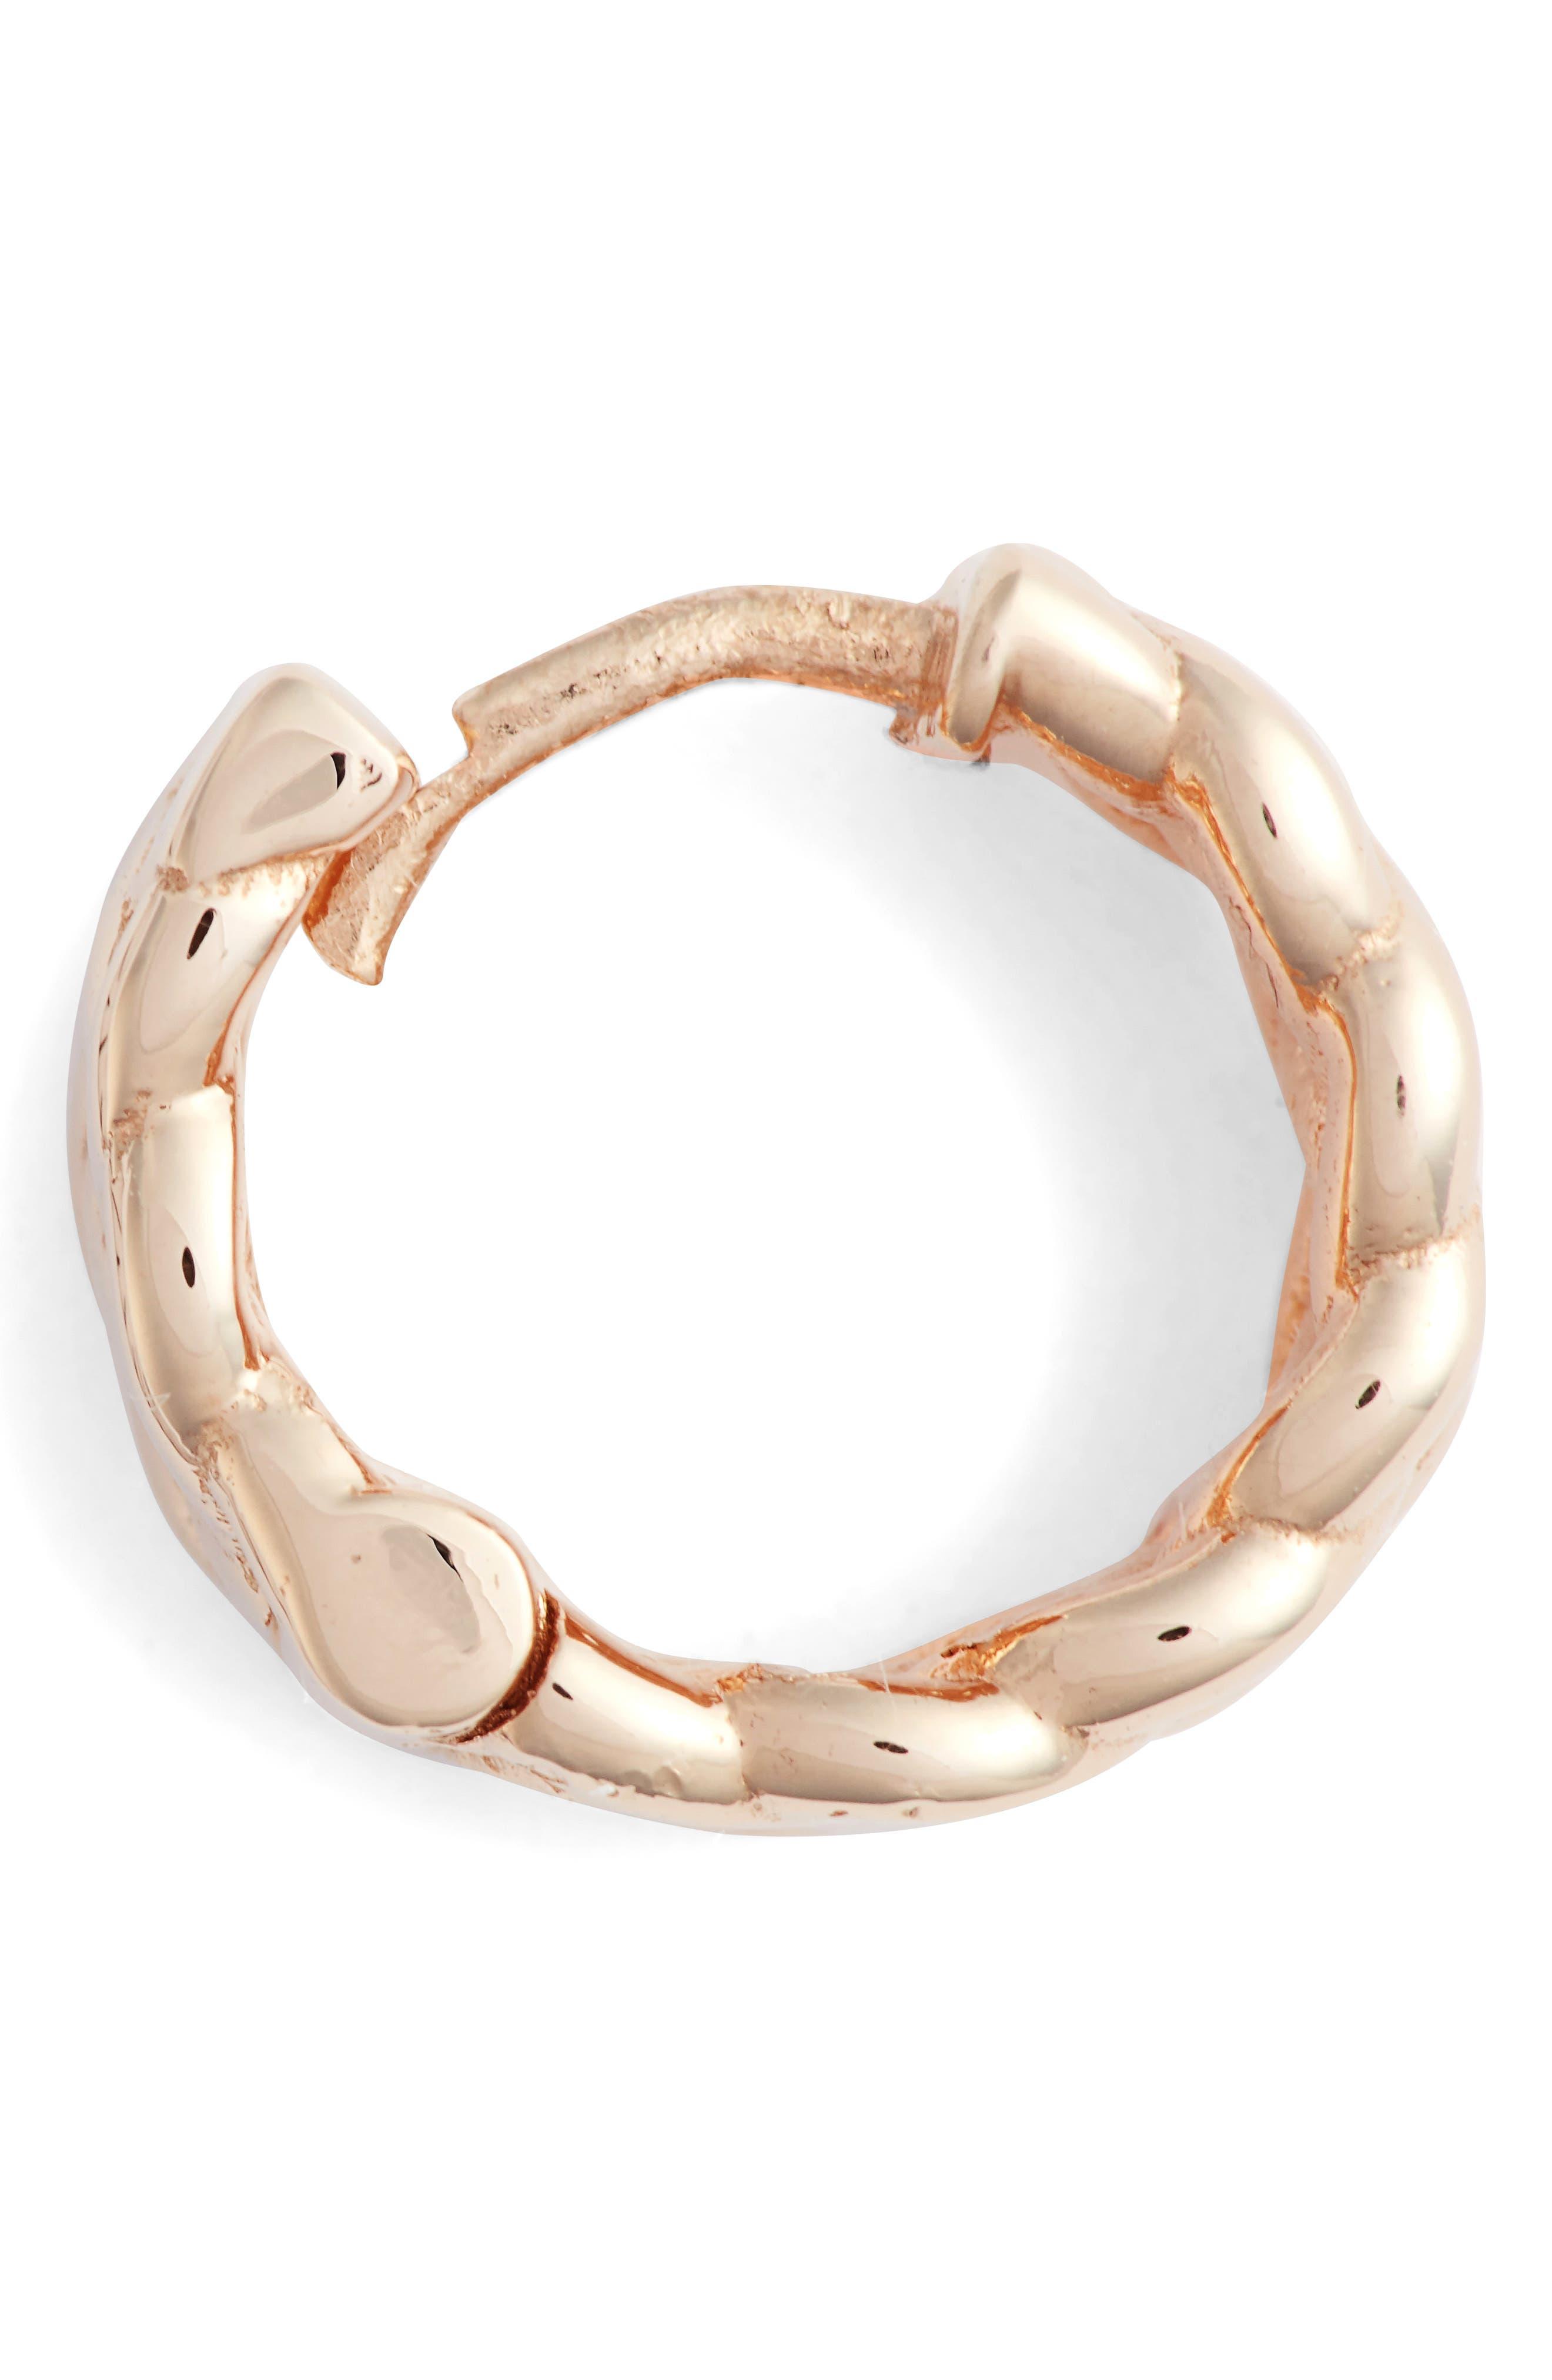 KISMET BY MILKA, Single Braided Gold Hoop Earring, Alternate thumbnail 5, color, ROSE GOLD